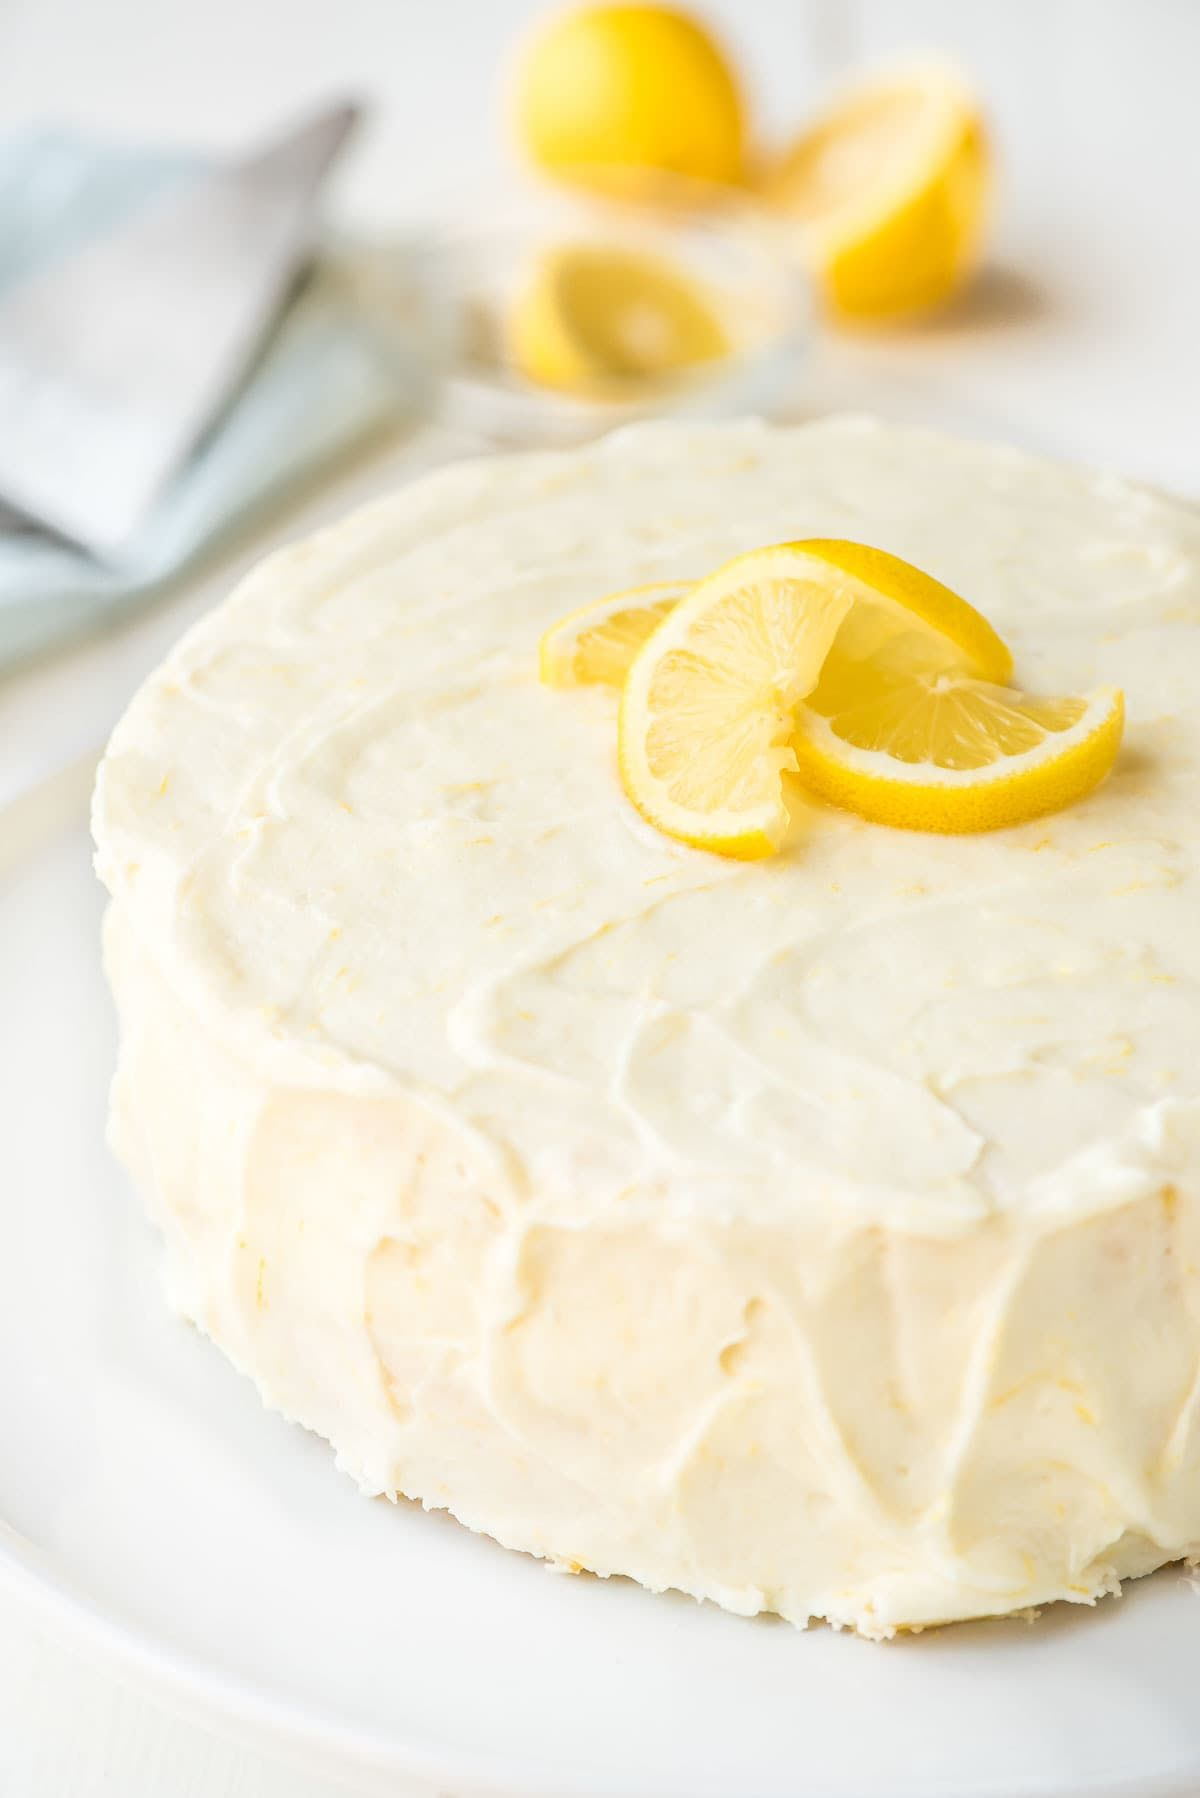 15 Best Lemon Cake Recipes - How to Make Lemon Cake from Scratch